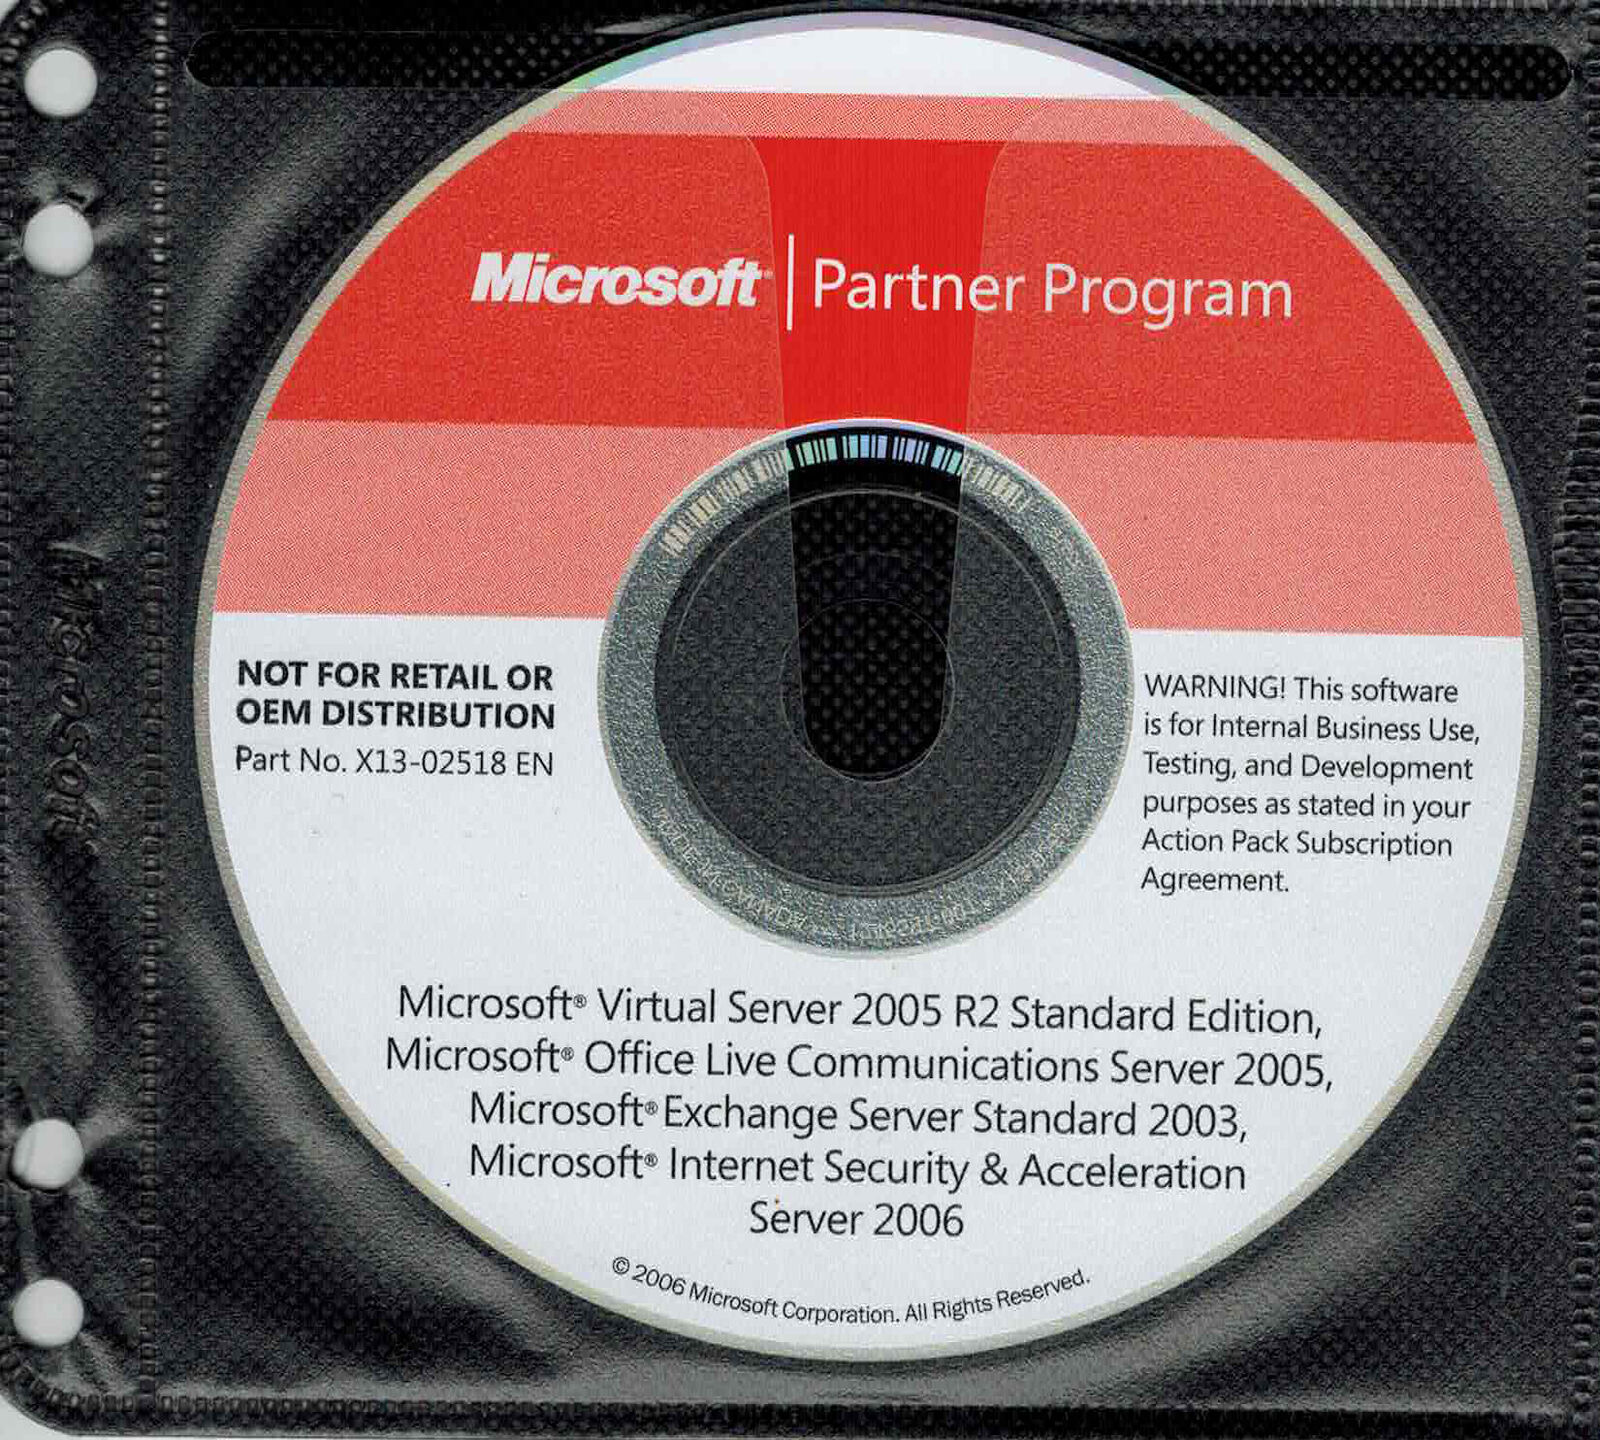 Microsoft isa server 2006 standard internet security 1 cpu.